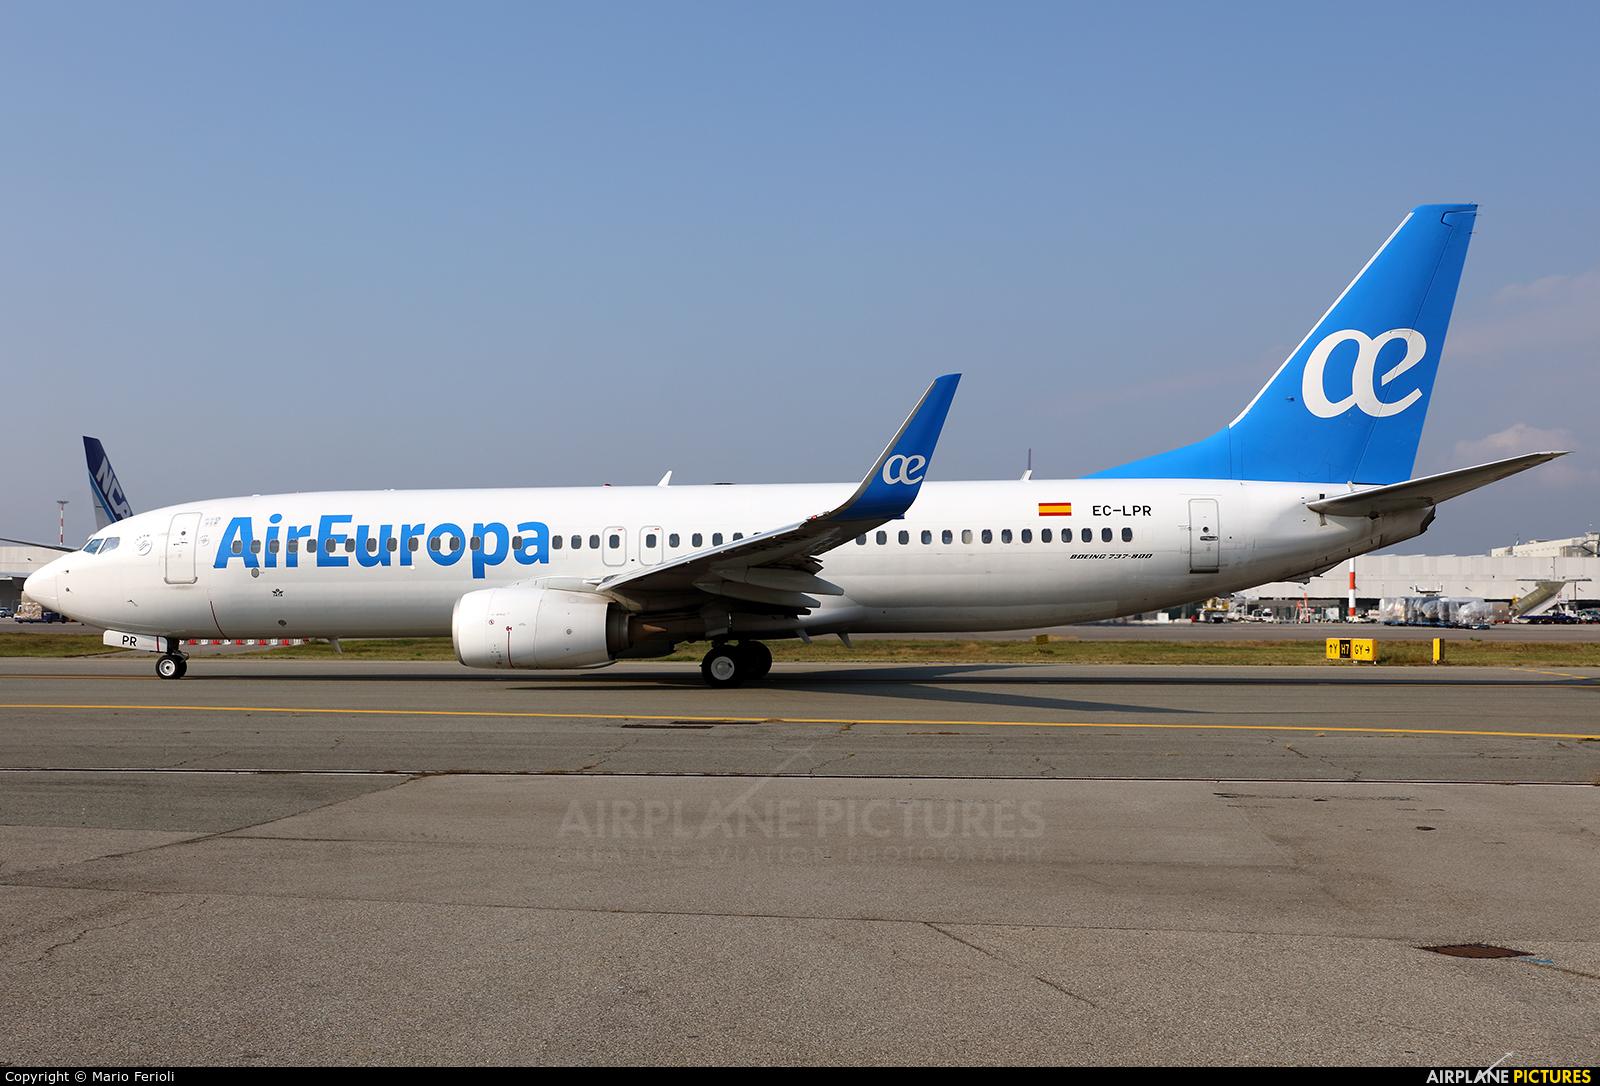 Air Europa EC-LPR aircraft at Milan - Malpensa